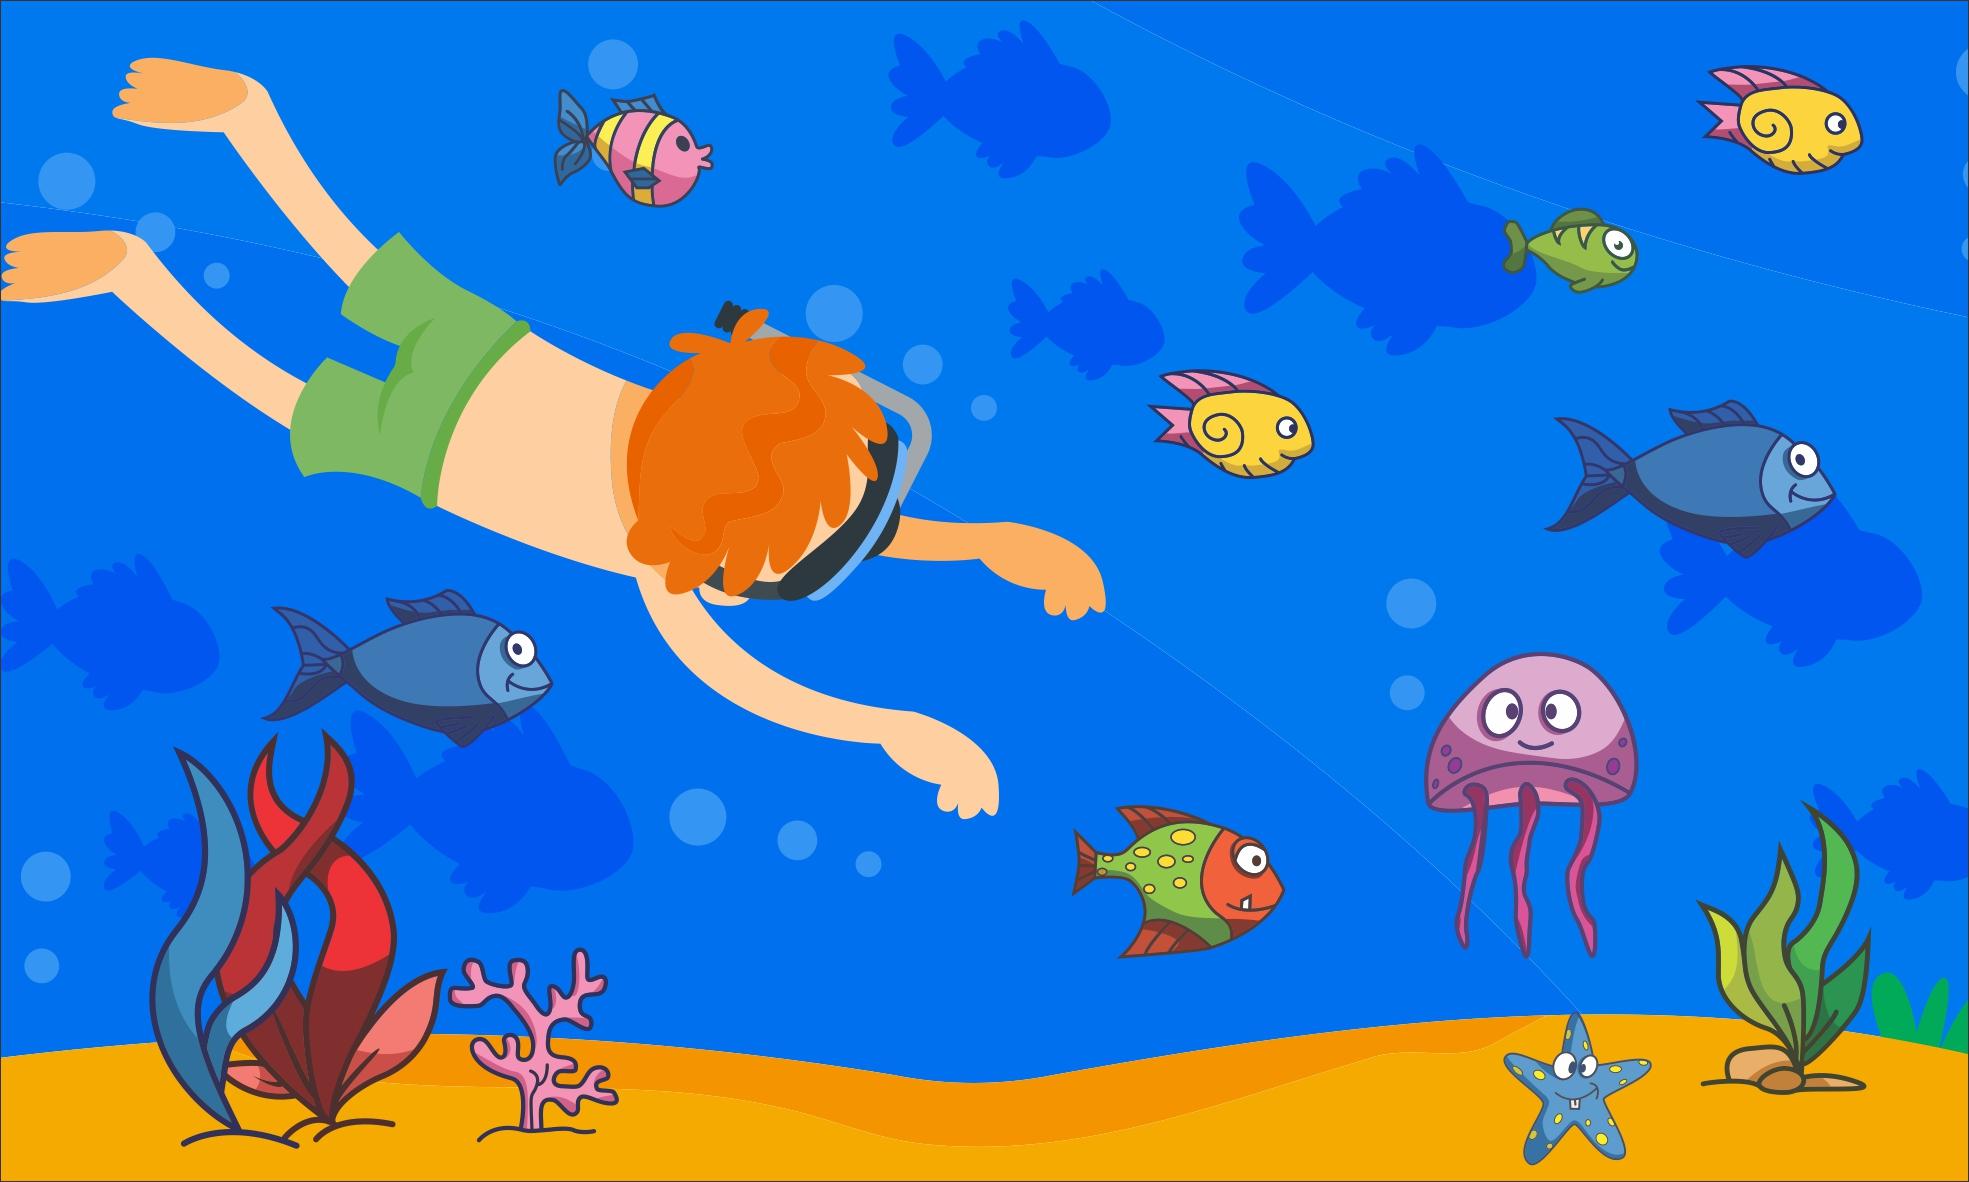 painel fundo do mar g frete gr u00e1tis atelier toque final elo7 Fish Clip Art Borders and Corners fish border clip art free